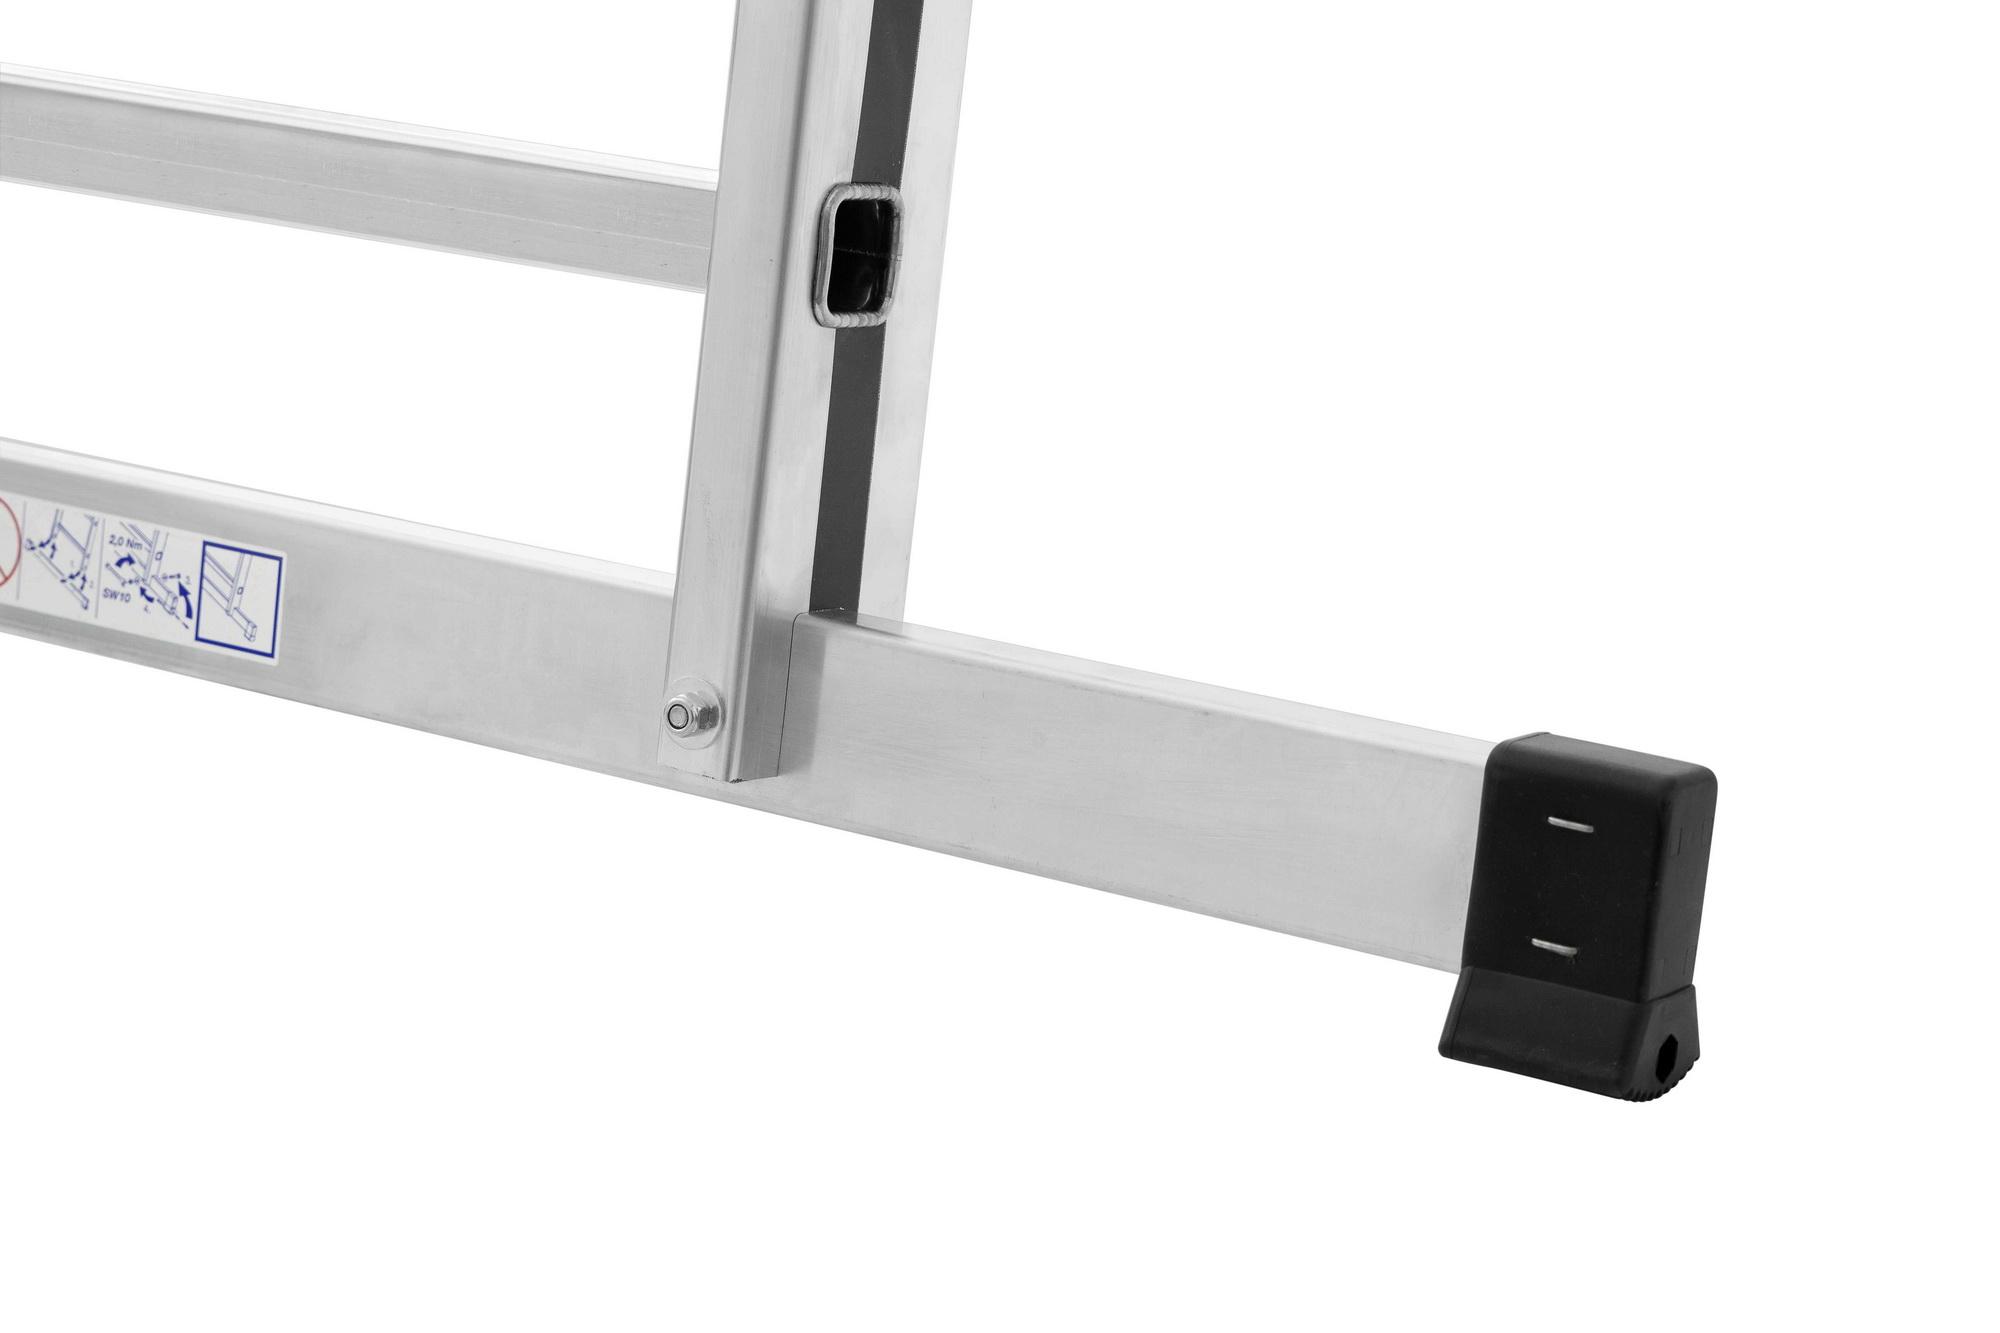 hymer mehrzweckleiter 70045 2x12 sprossen alu pro baudienst onlineshop. Black Bedroom Furniture Sets. Home Design Ideas